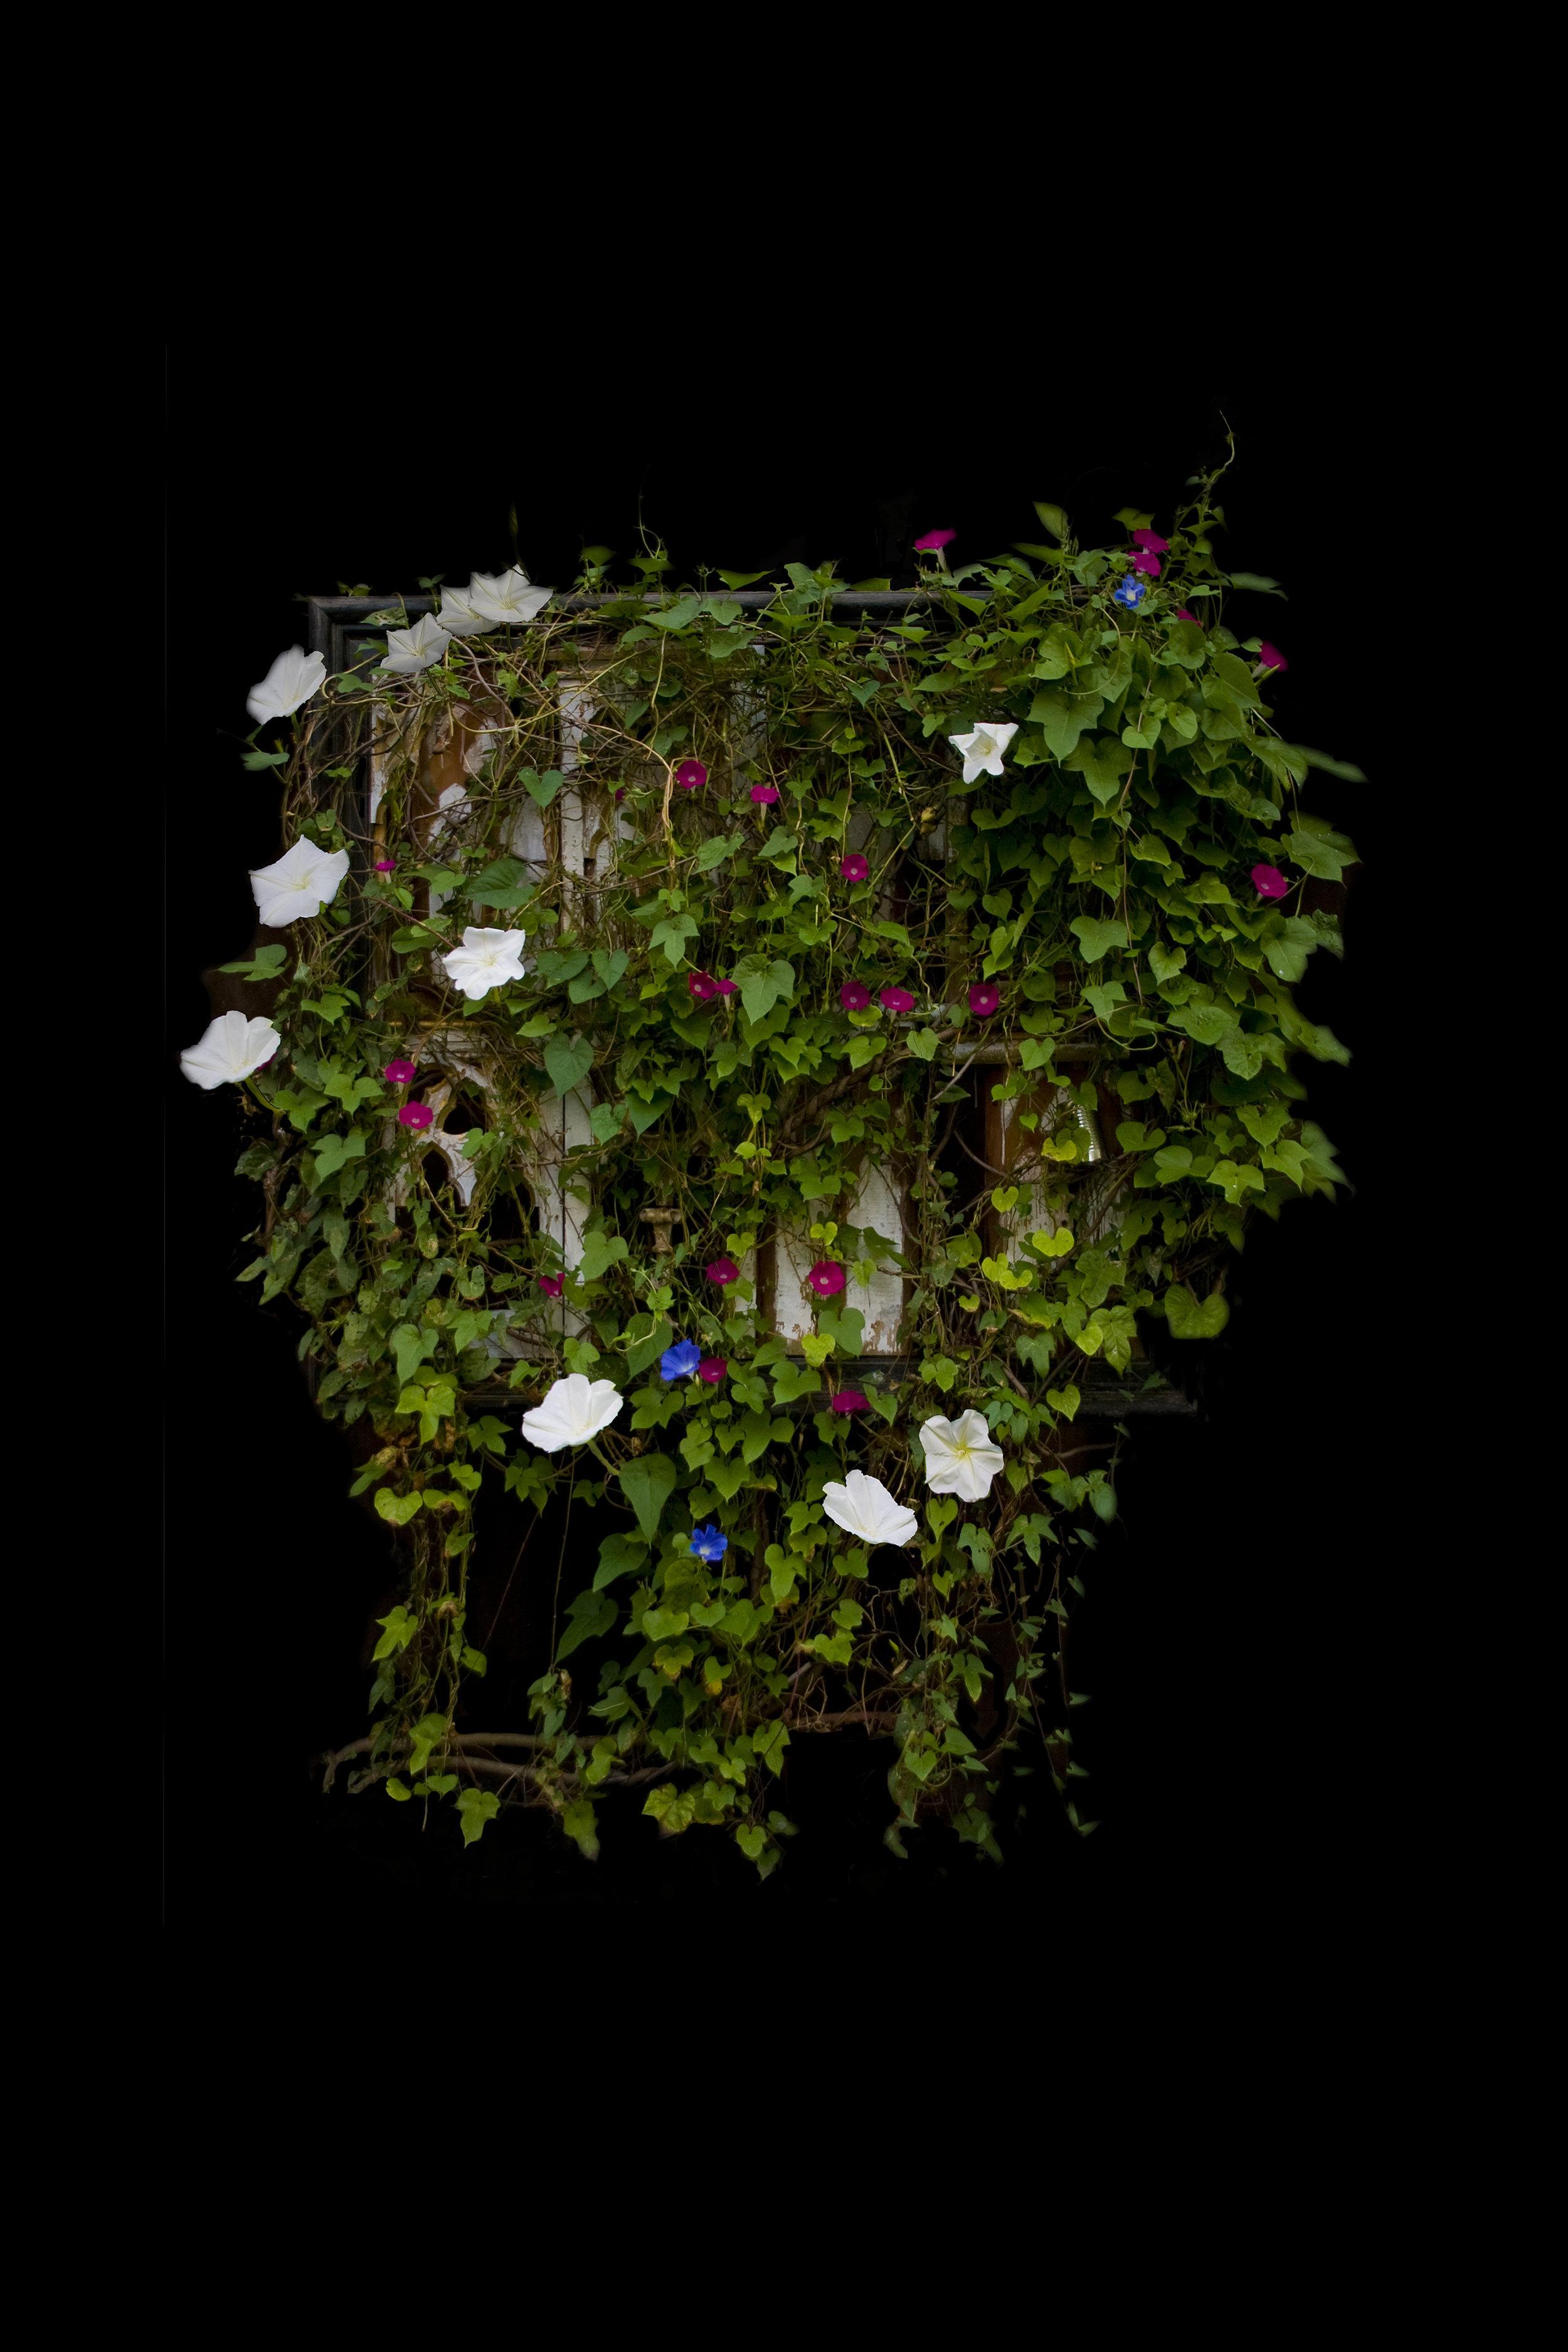 Moonflower Fullbloom, Photograph/Sculpture, Robert Hite, 2010